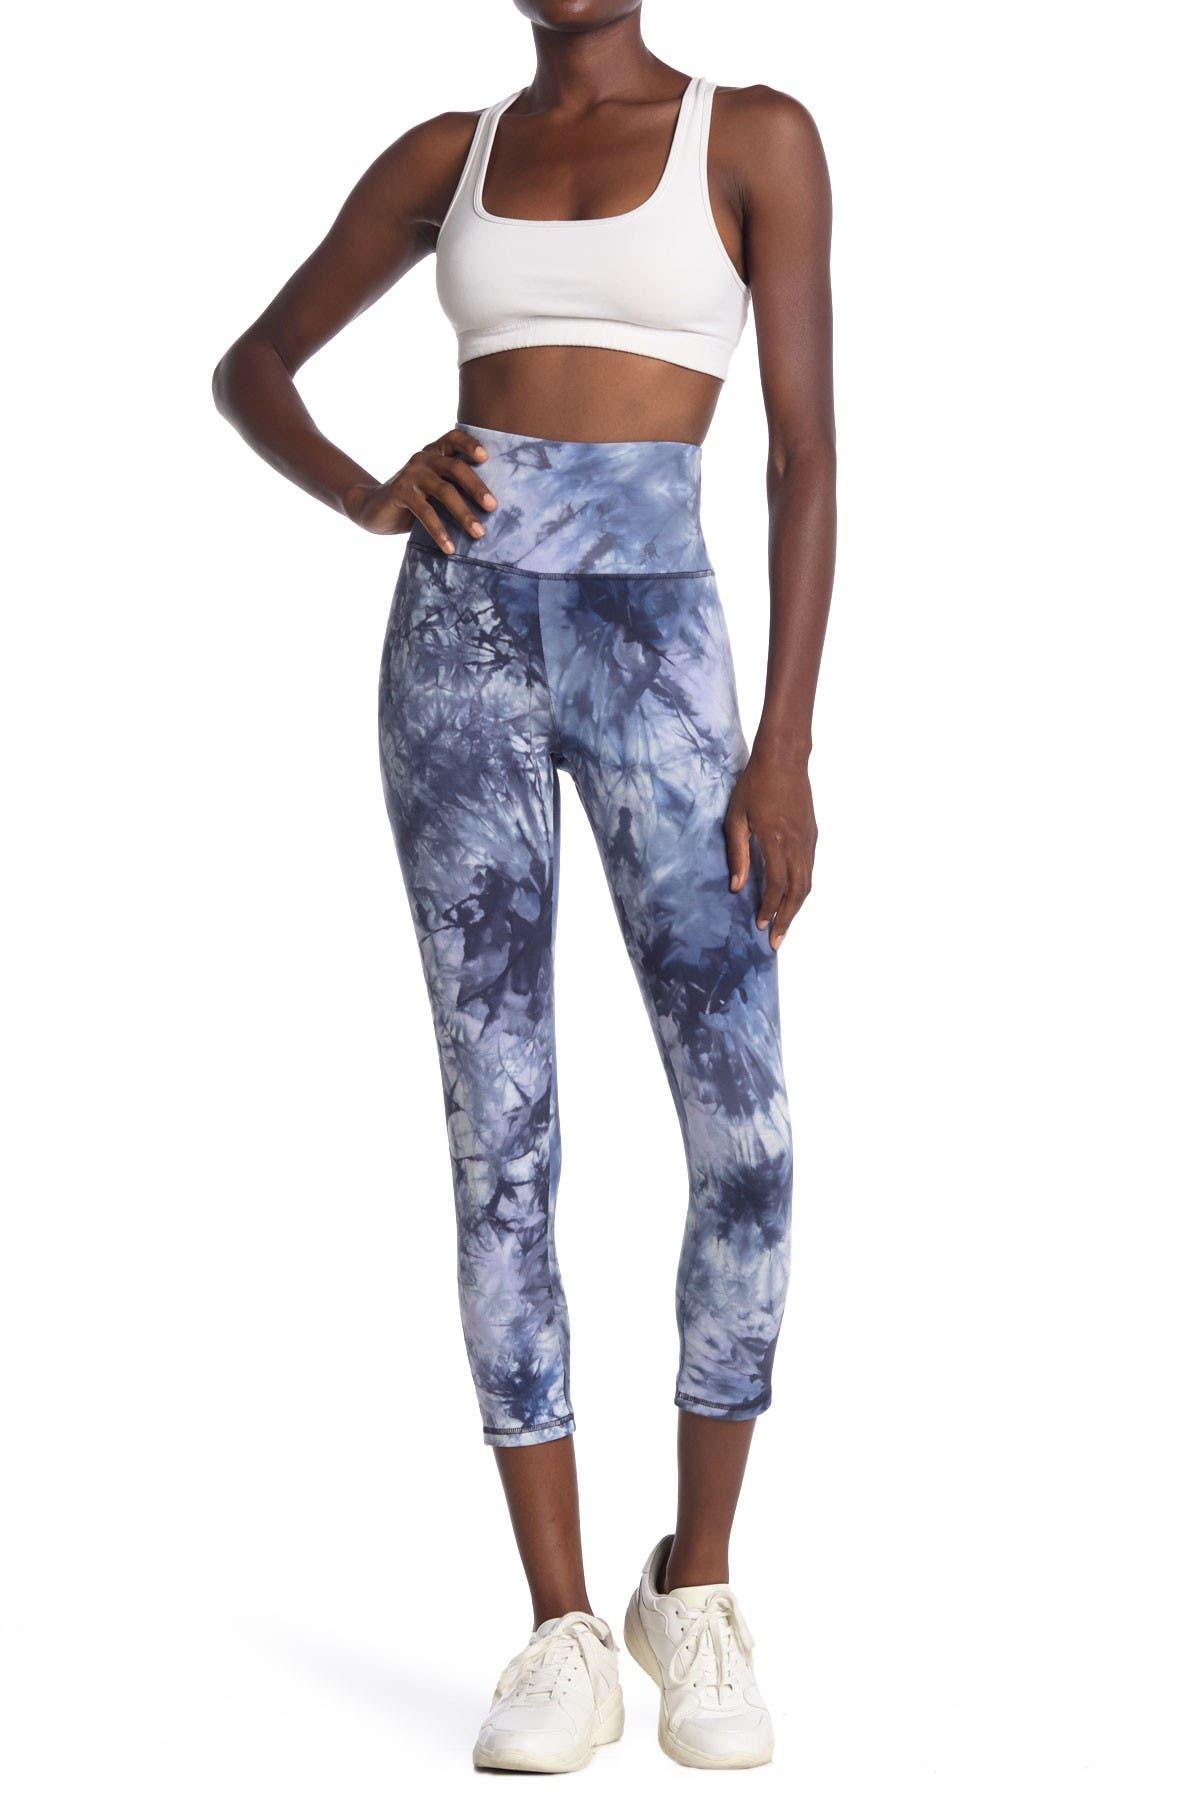 Image of Marika Christy Tie Dye Print Capri Leggings